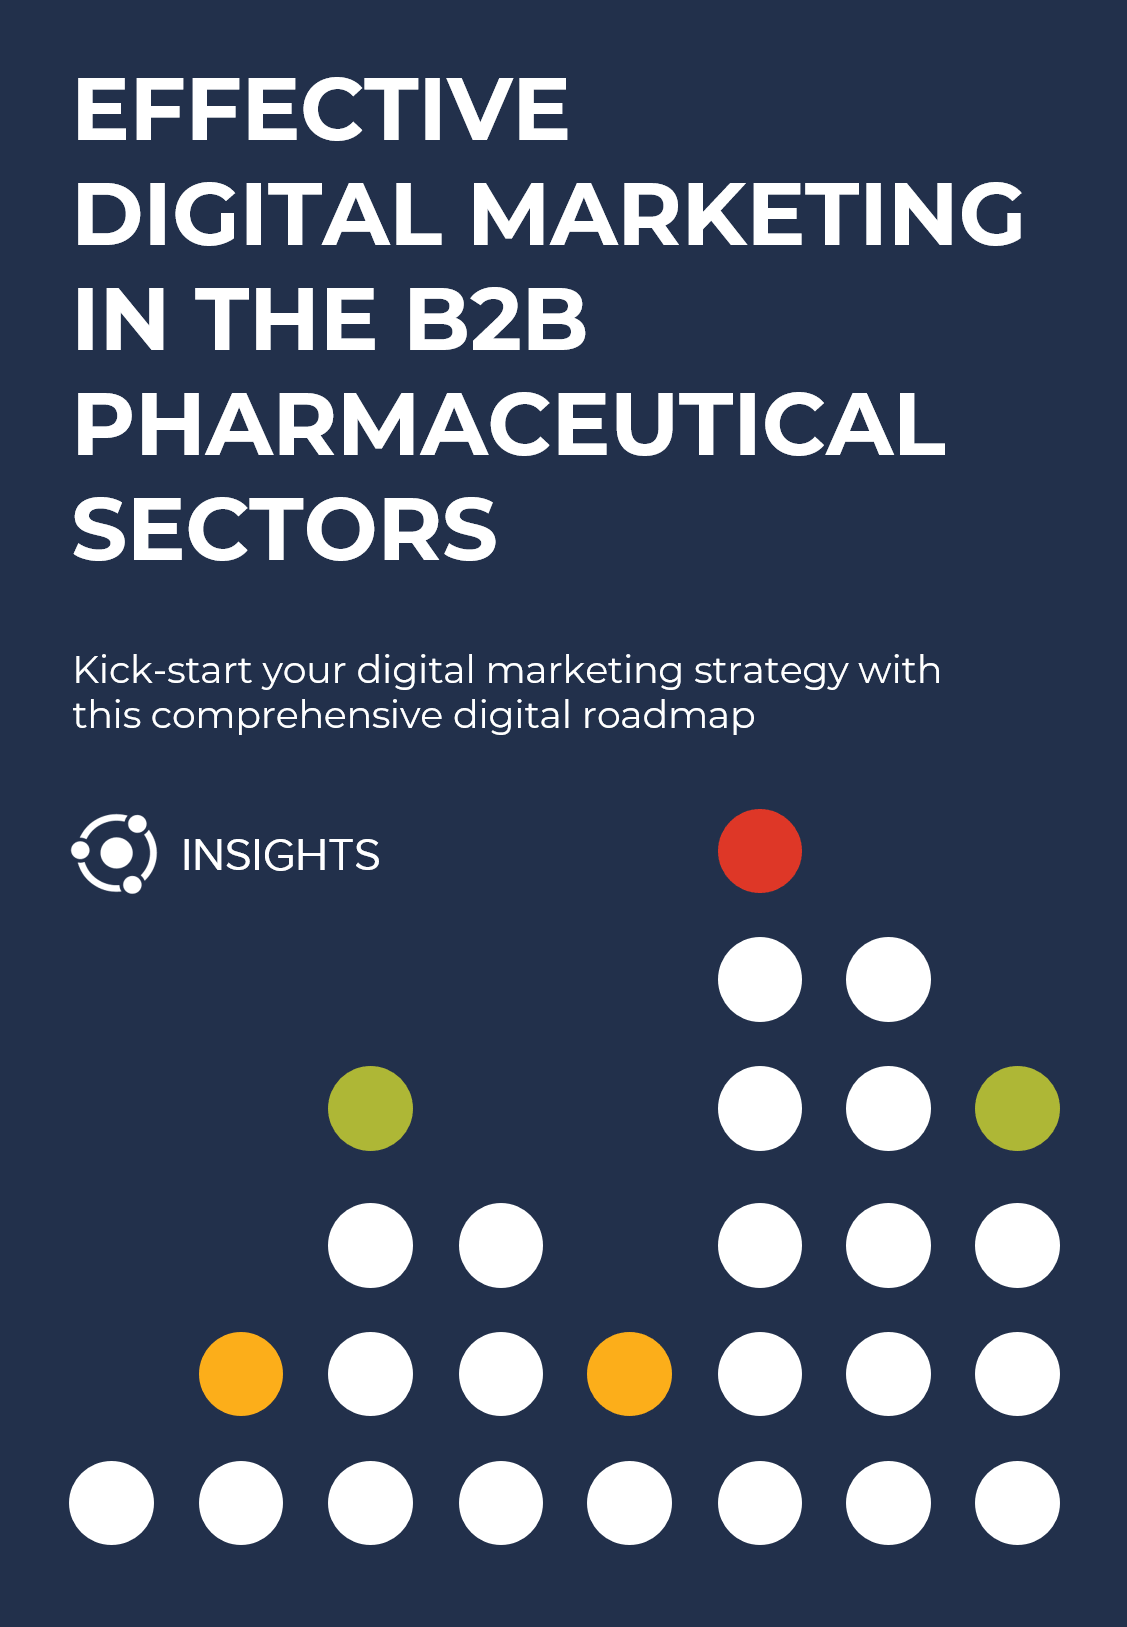 Digital Marketing in the B2B pharmaceutical sectors.png